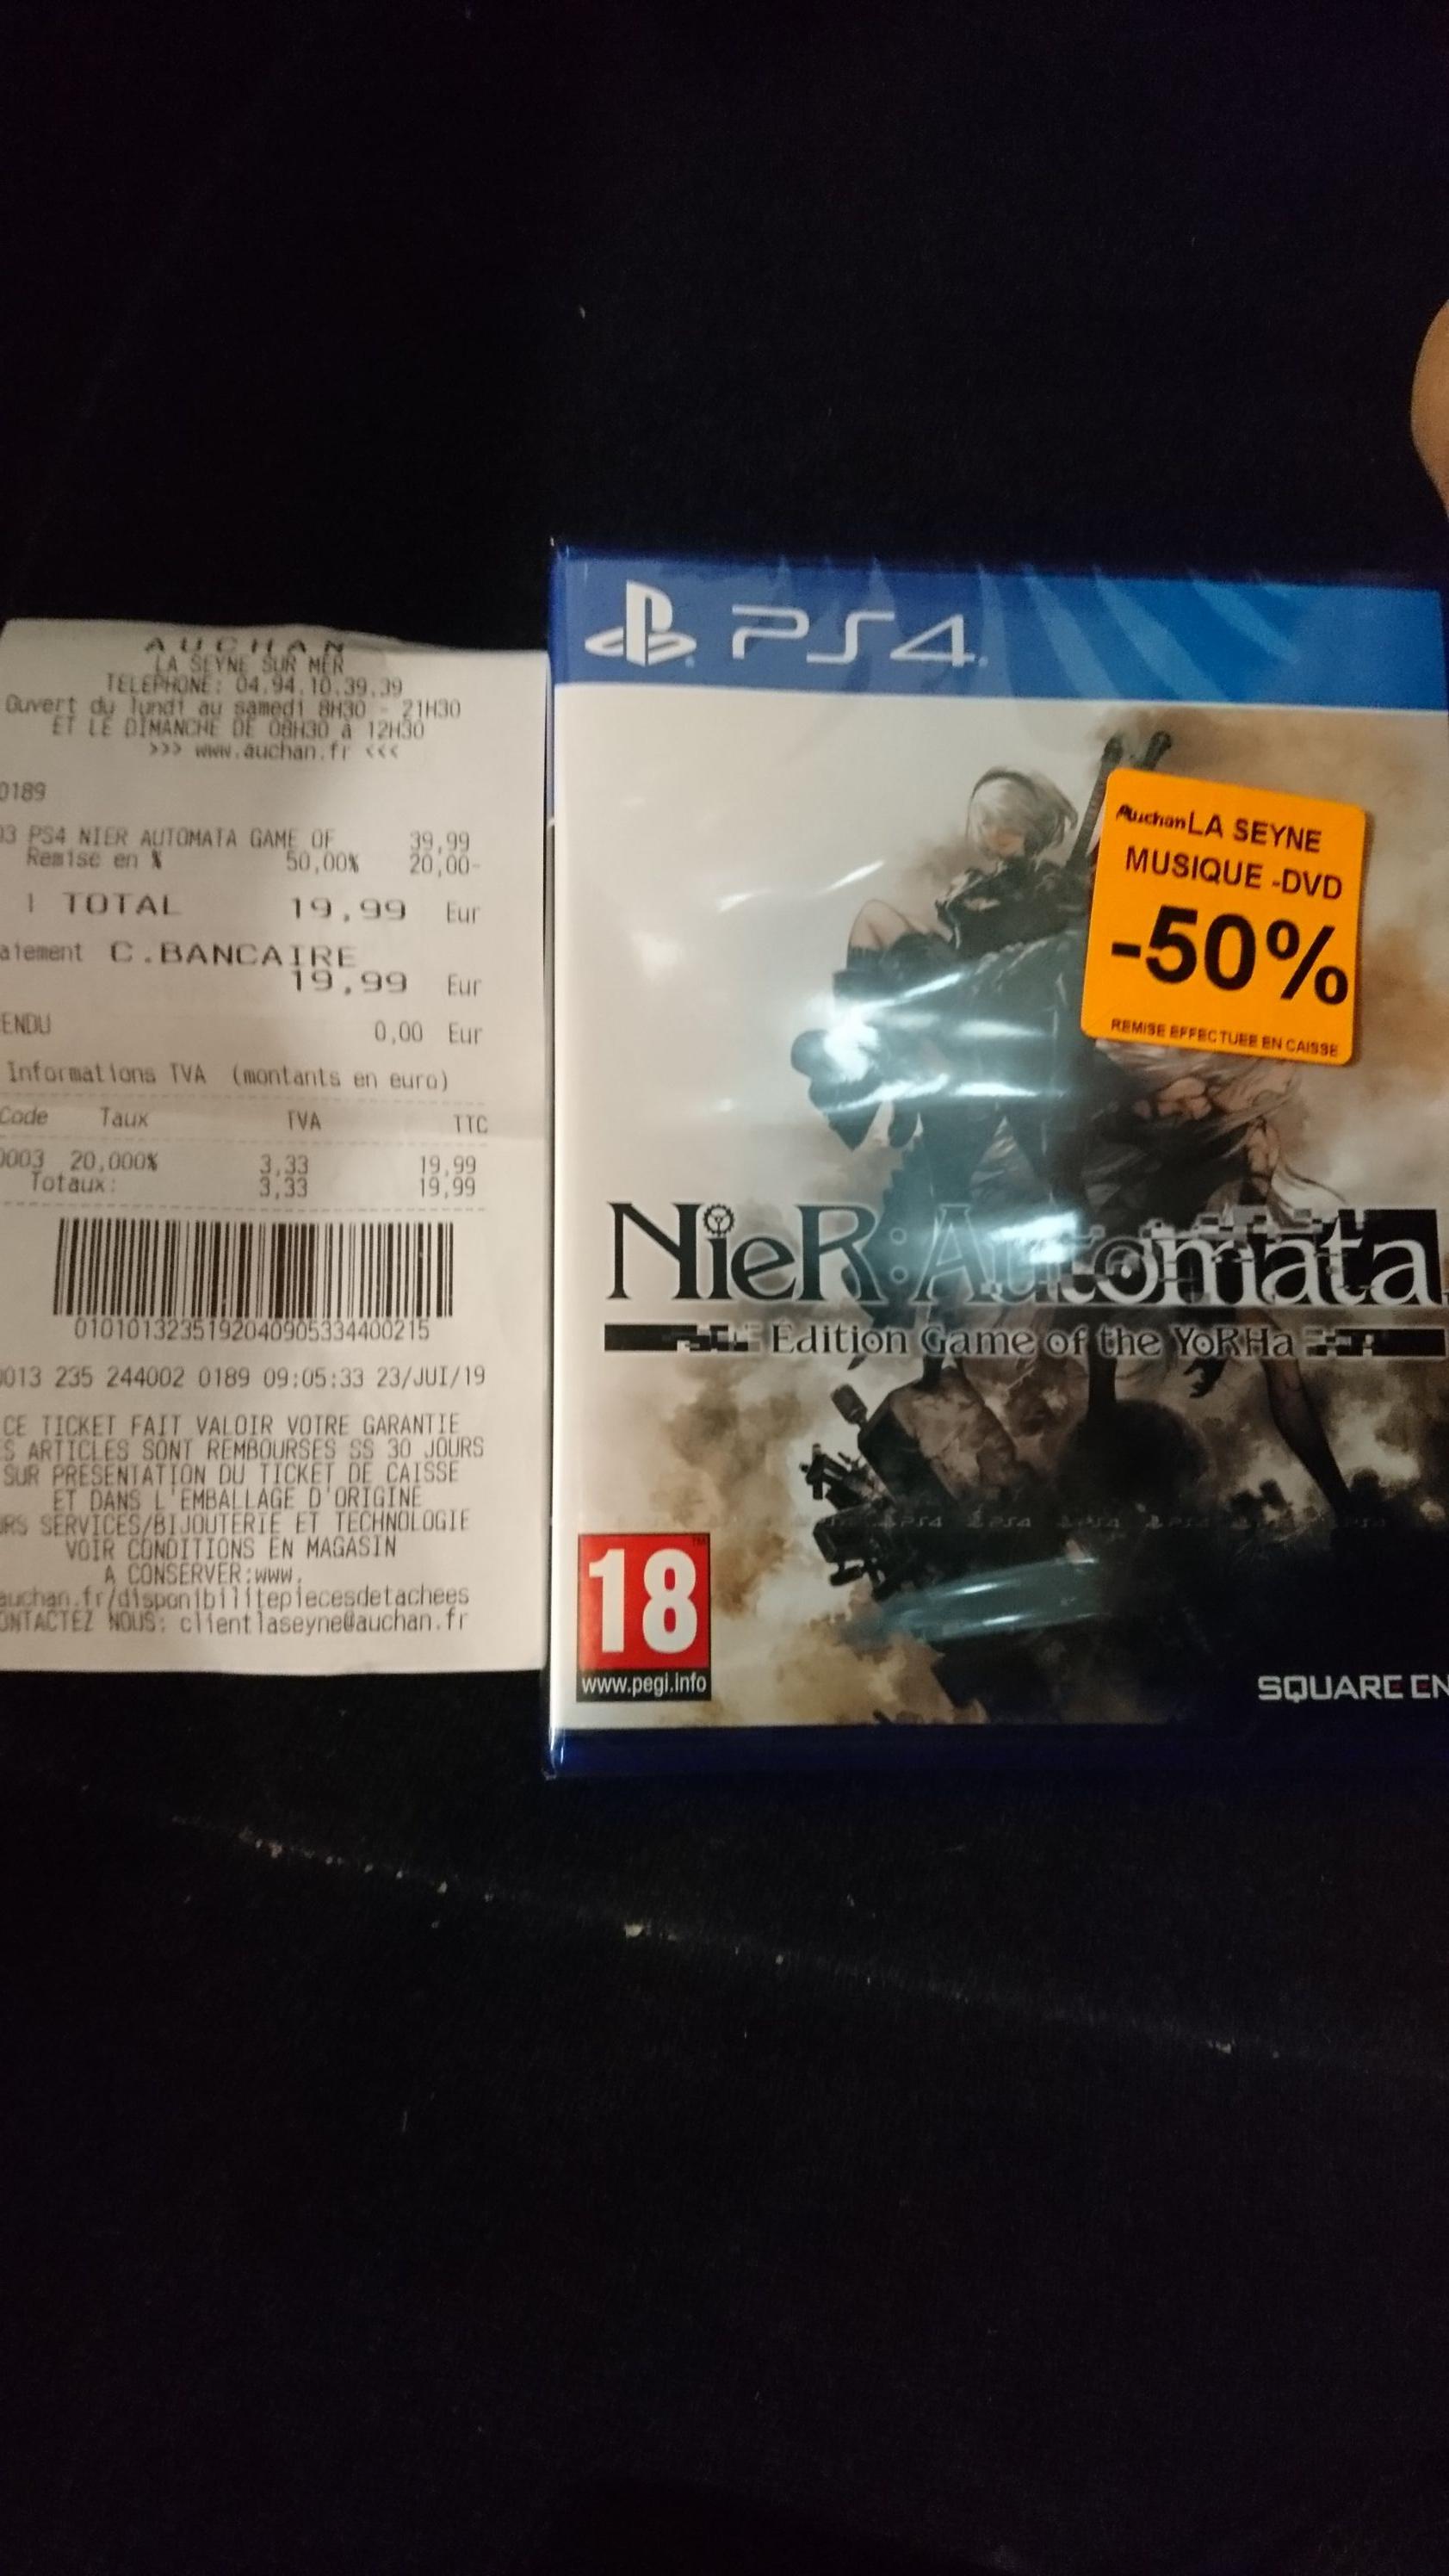 Nier: Automata goty sur PS4 -  La Seyne (83)